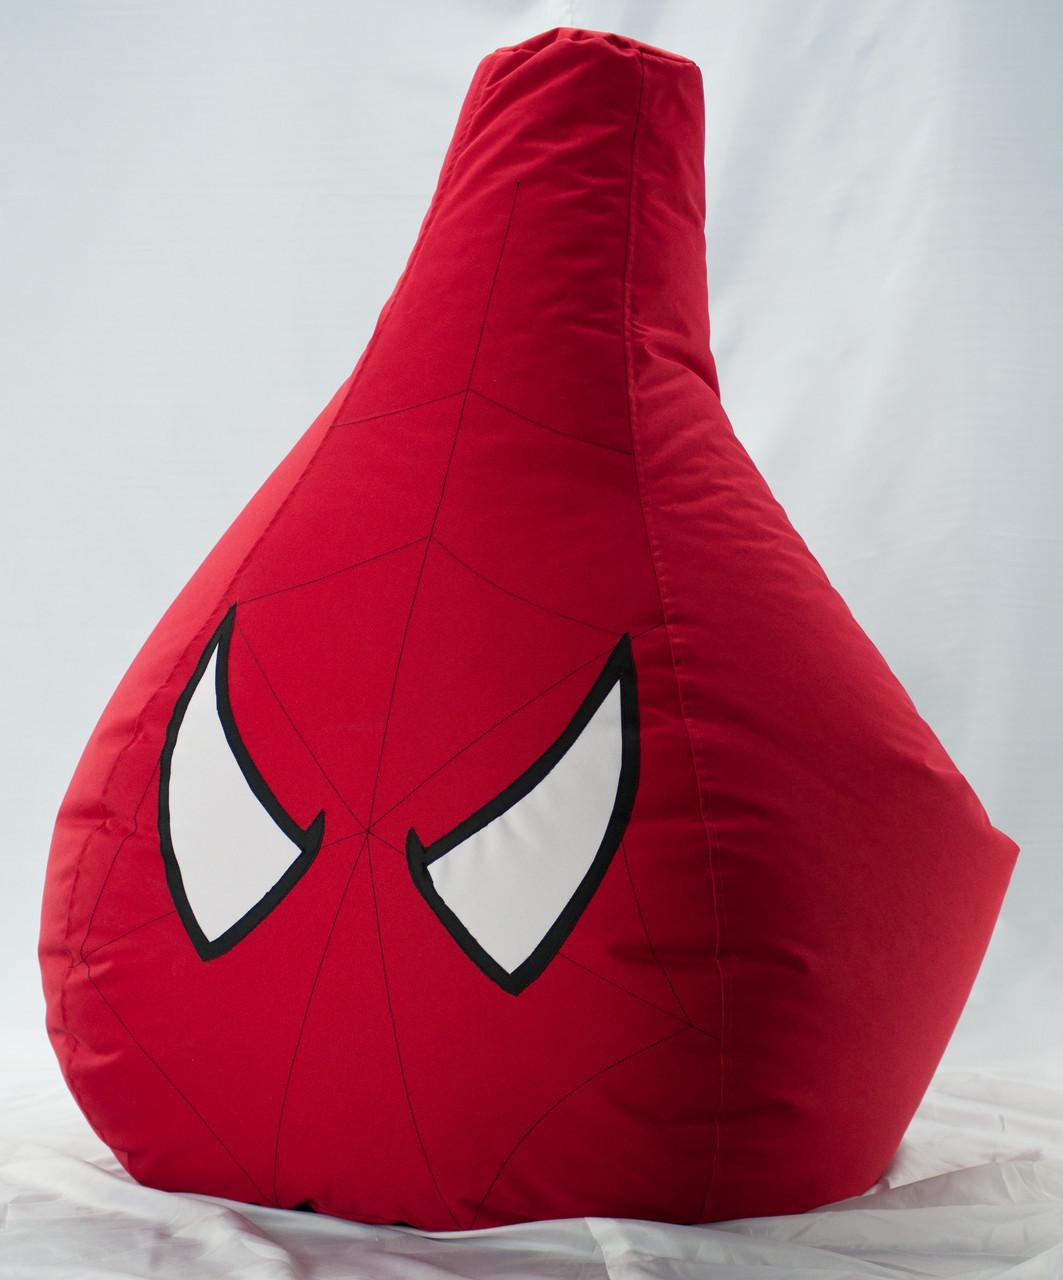 Кресло мешок груша Человек Паук 90*130 см